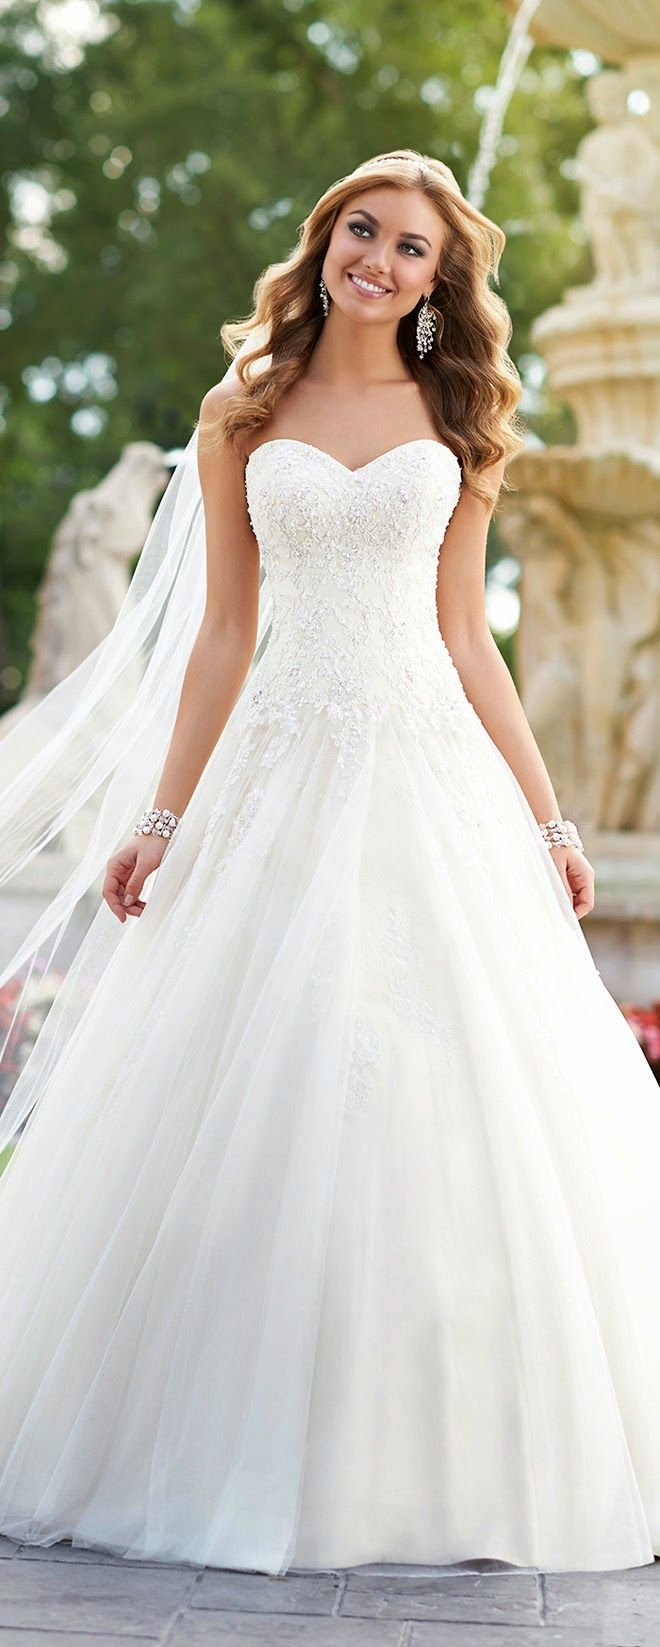 98 best Wedding dresses images on Pinterest | Wedding ideas, Dream ...